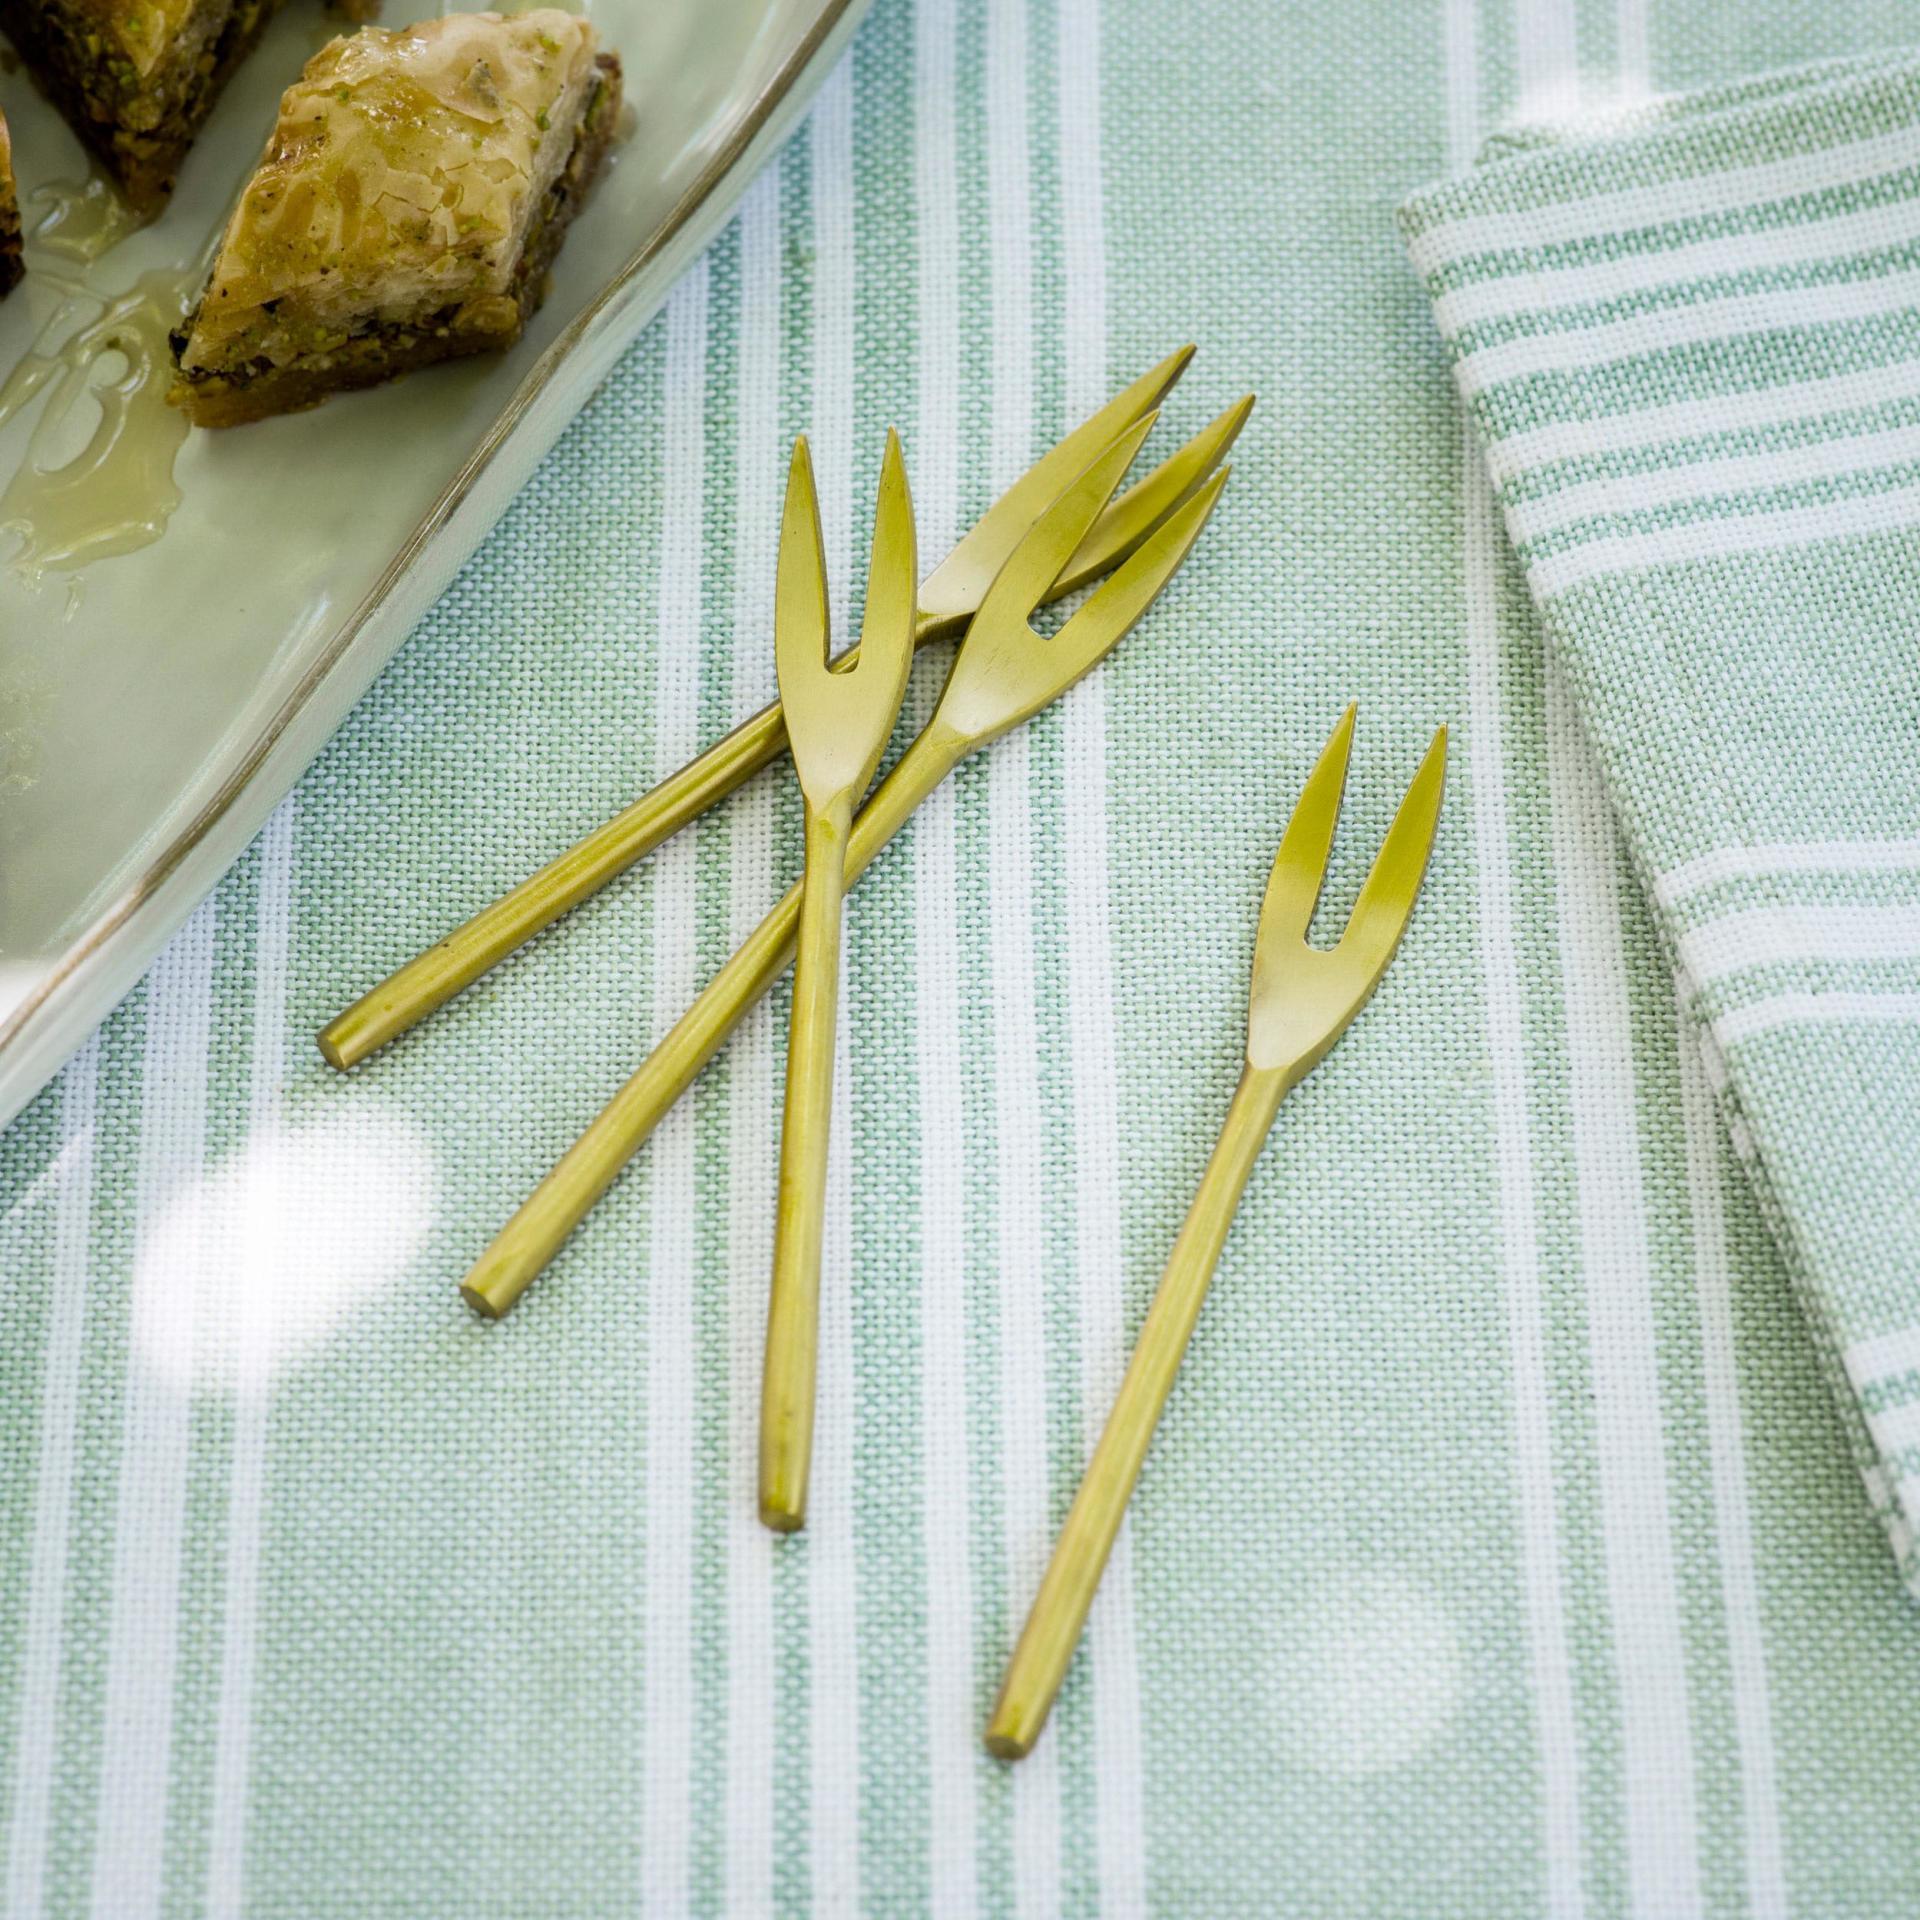 Garden Trading Mosazná mini vidlička Meze - set 4ks, zlatá barva, kov